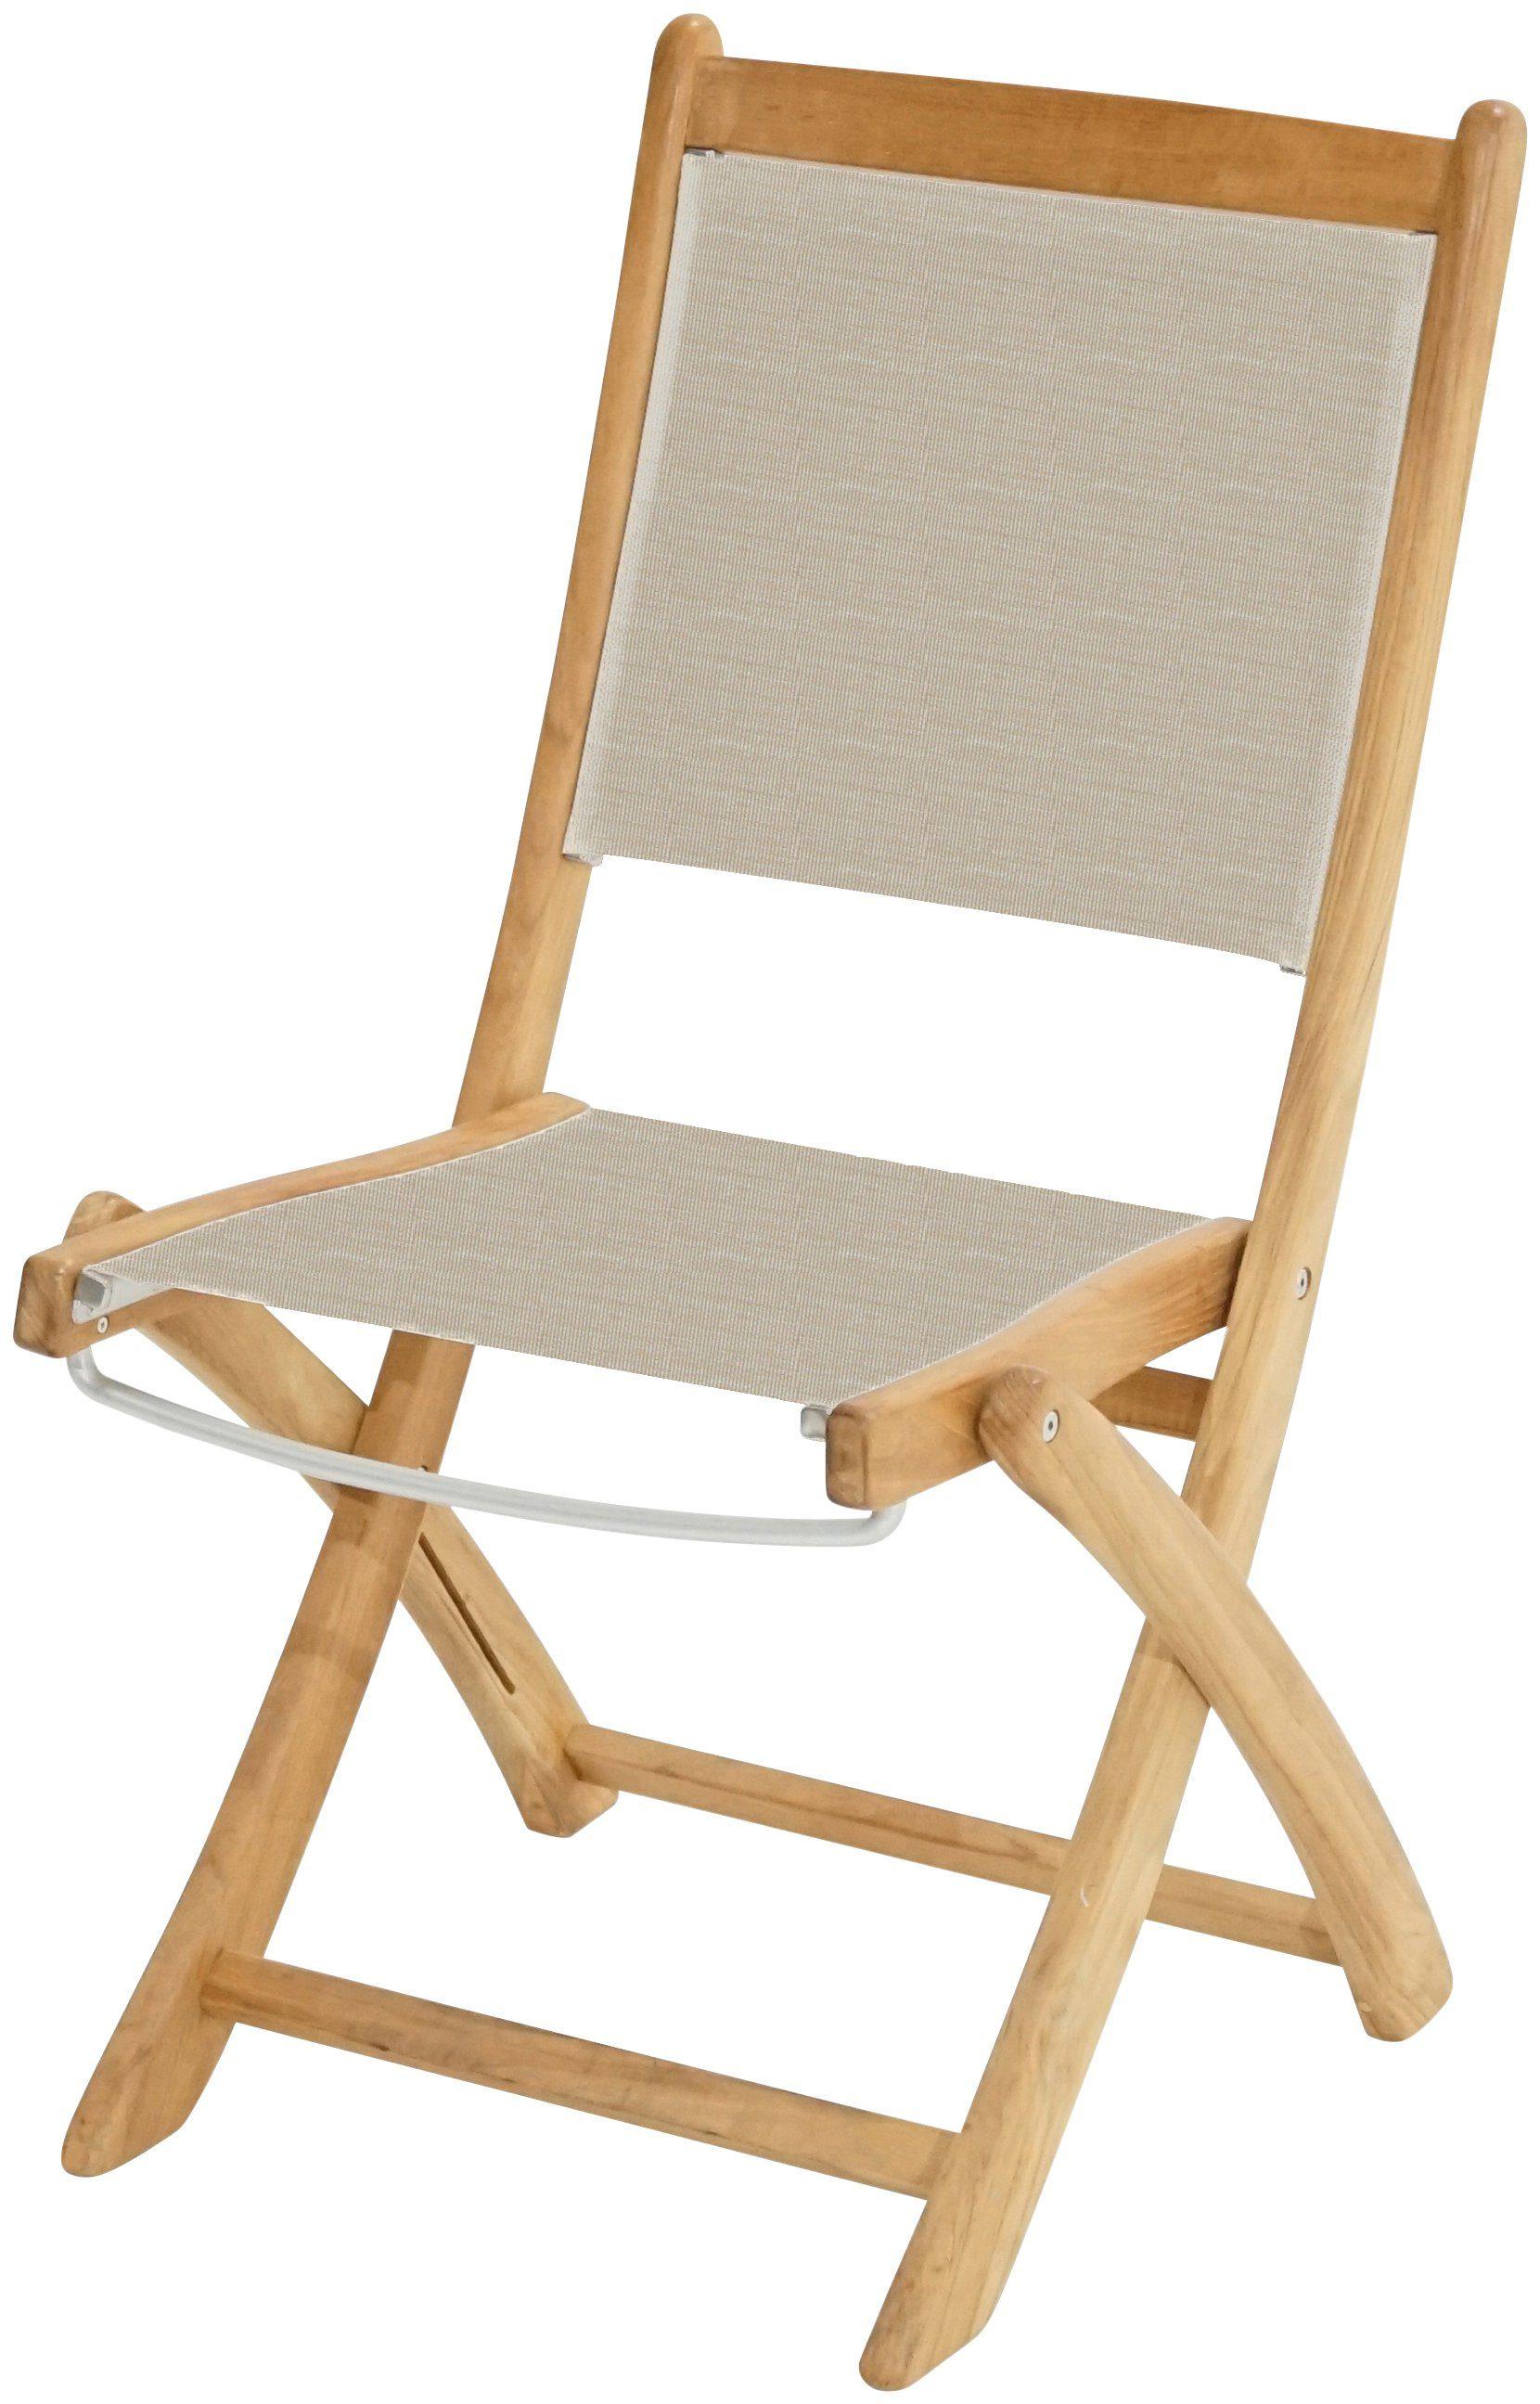 PLOSS Gartenstuhl »Richmond«, Teak/Textil, klappbar, weiß